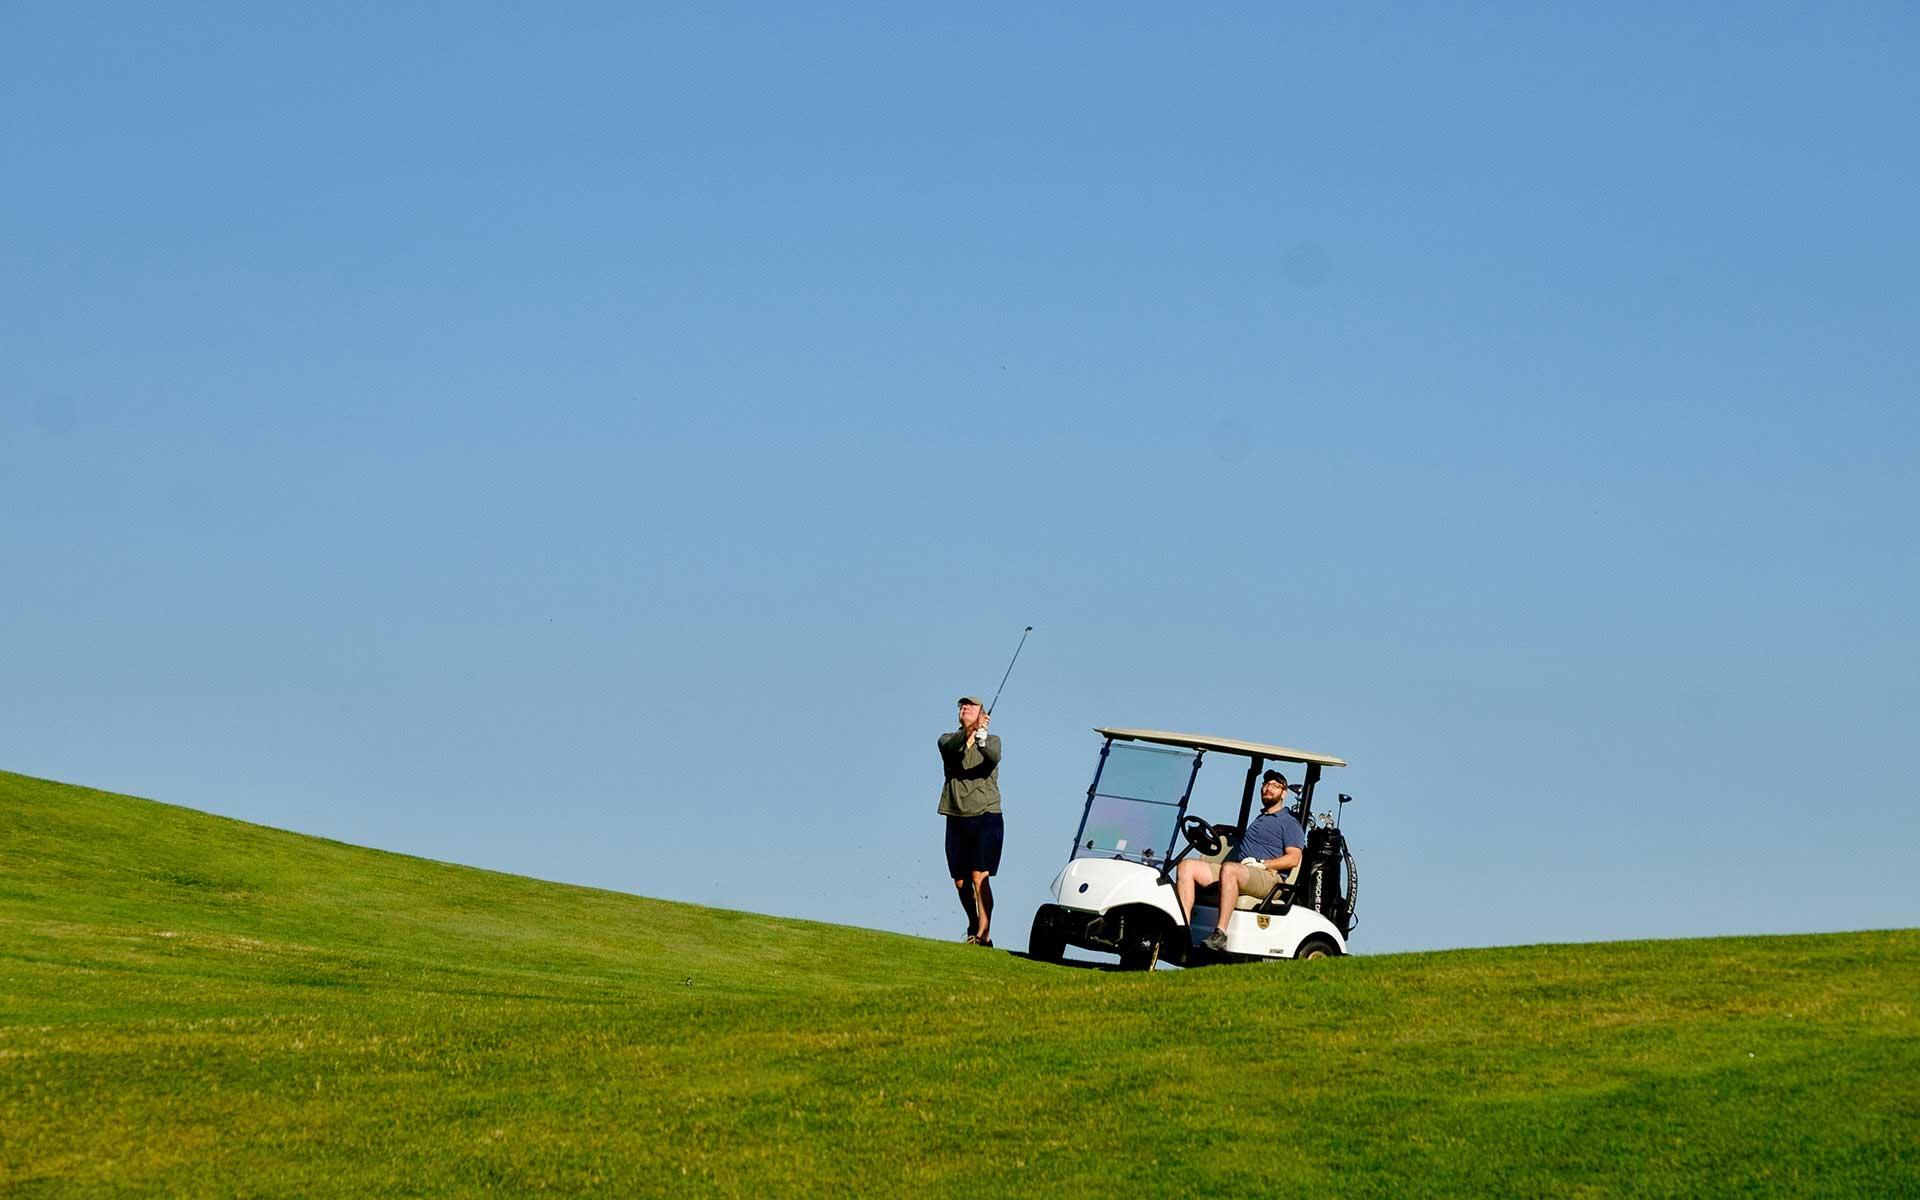 The Creek at Qualchan Golf Course - City of Spokane, Washington